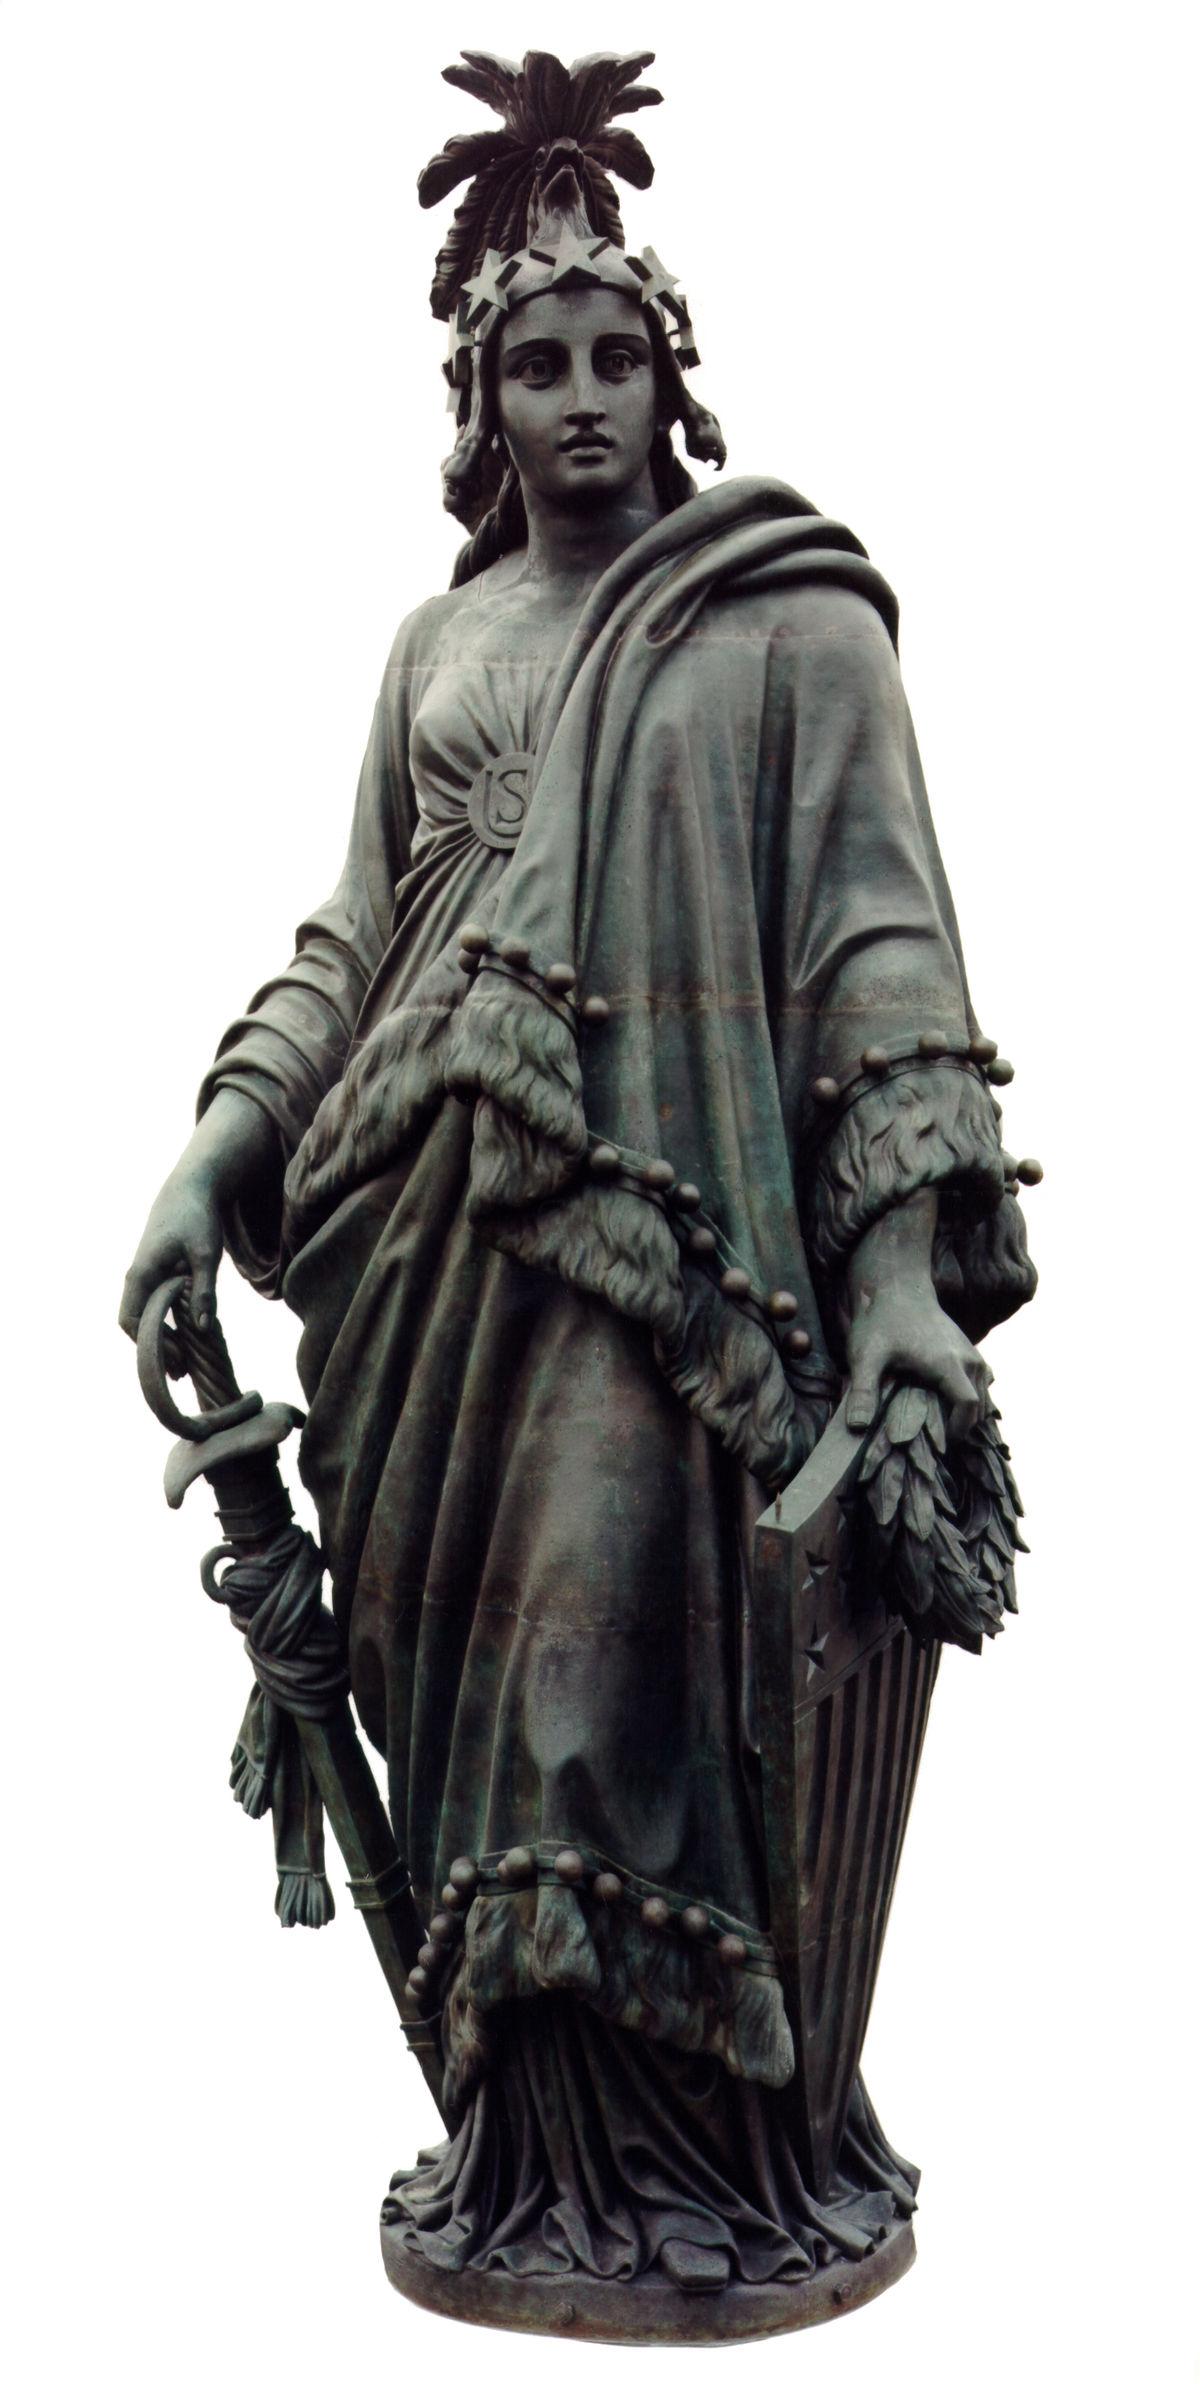 Statue of Freedom - Wikipedia